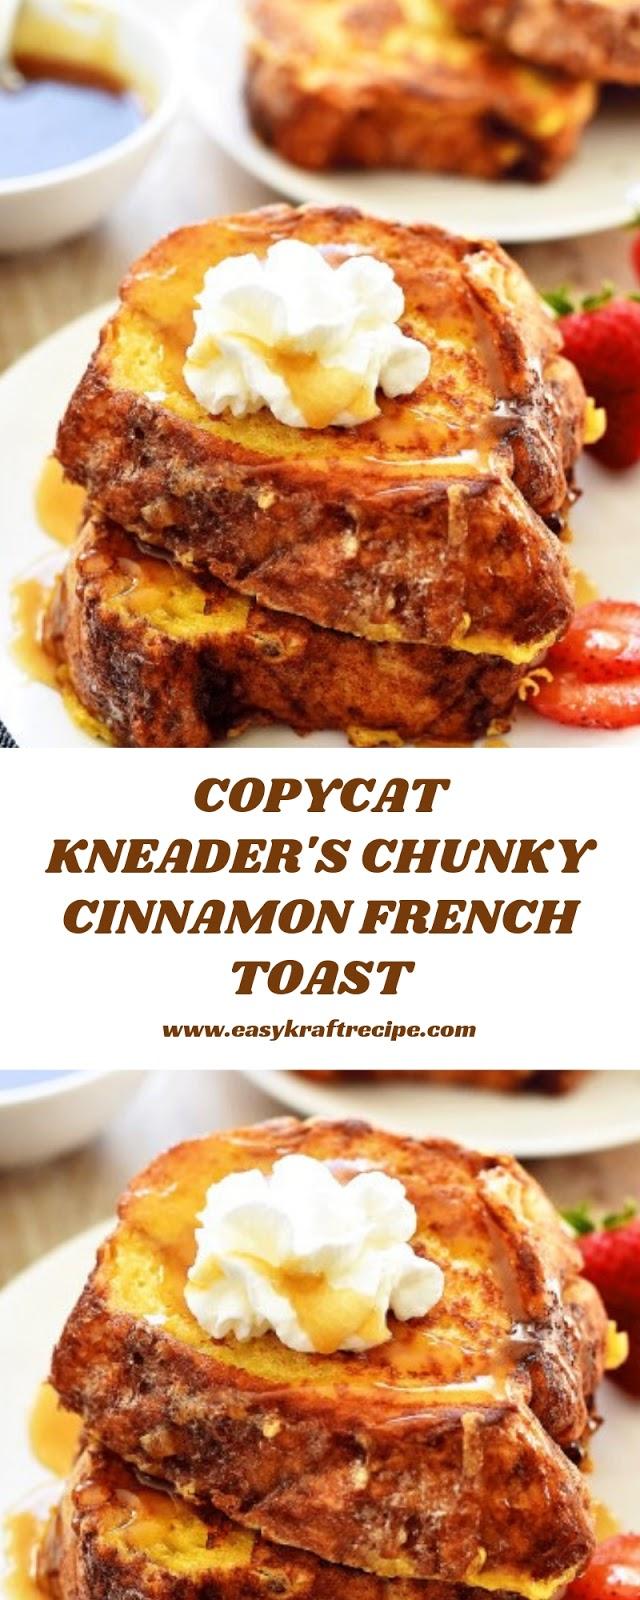 COPYCAT KNEADER'S CHUNKY CINNAMON FRENCH TOAST